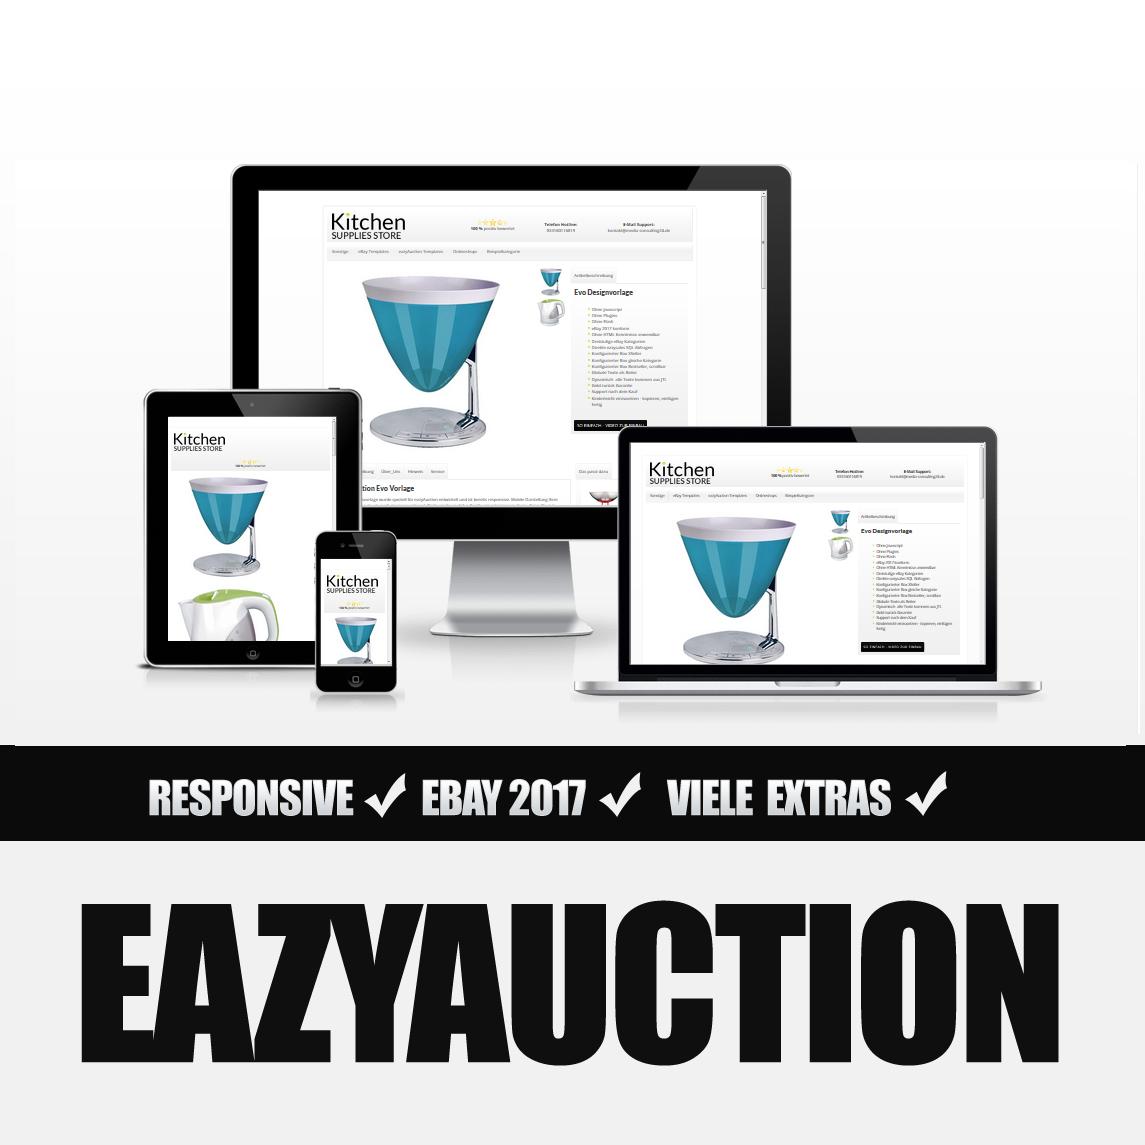 Eazyauction eBay Template 2017 #2-6